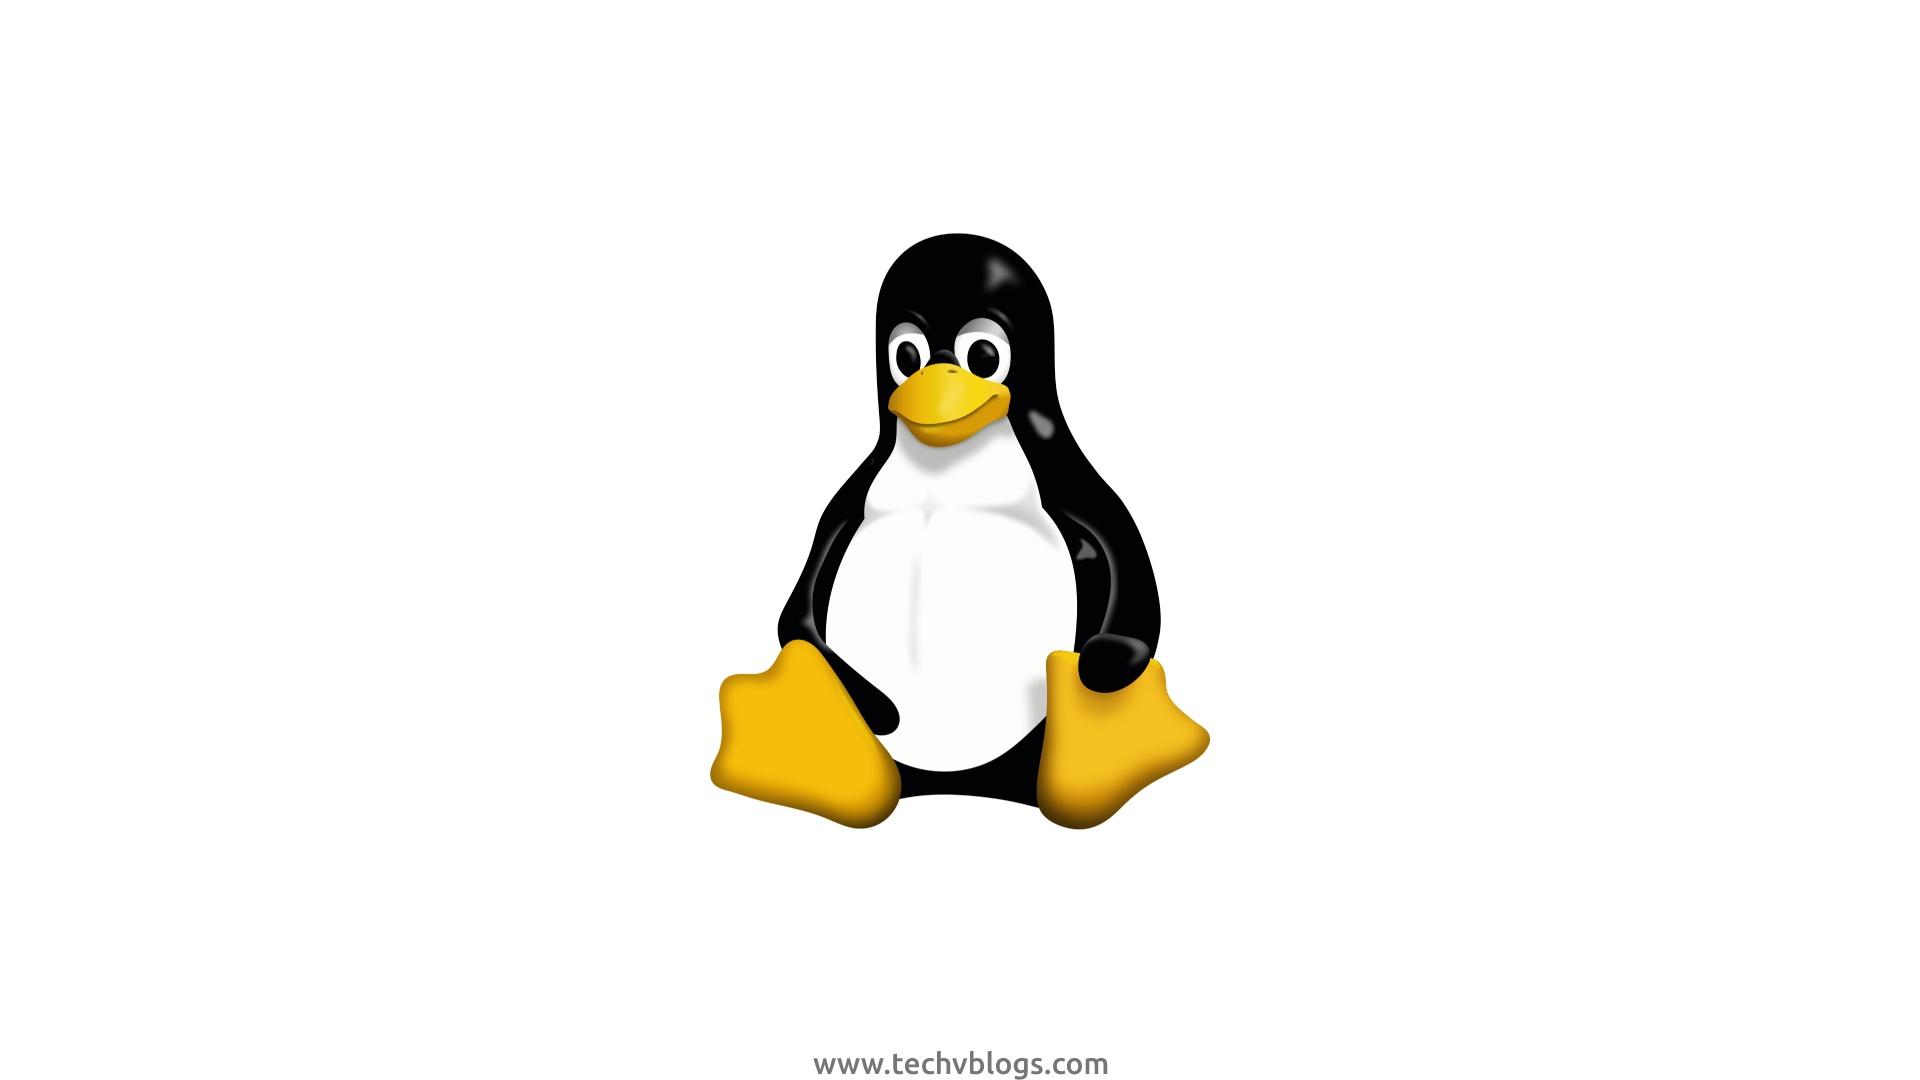 Linux - Category - TechvBlogs